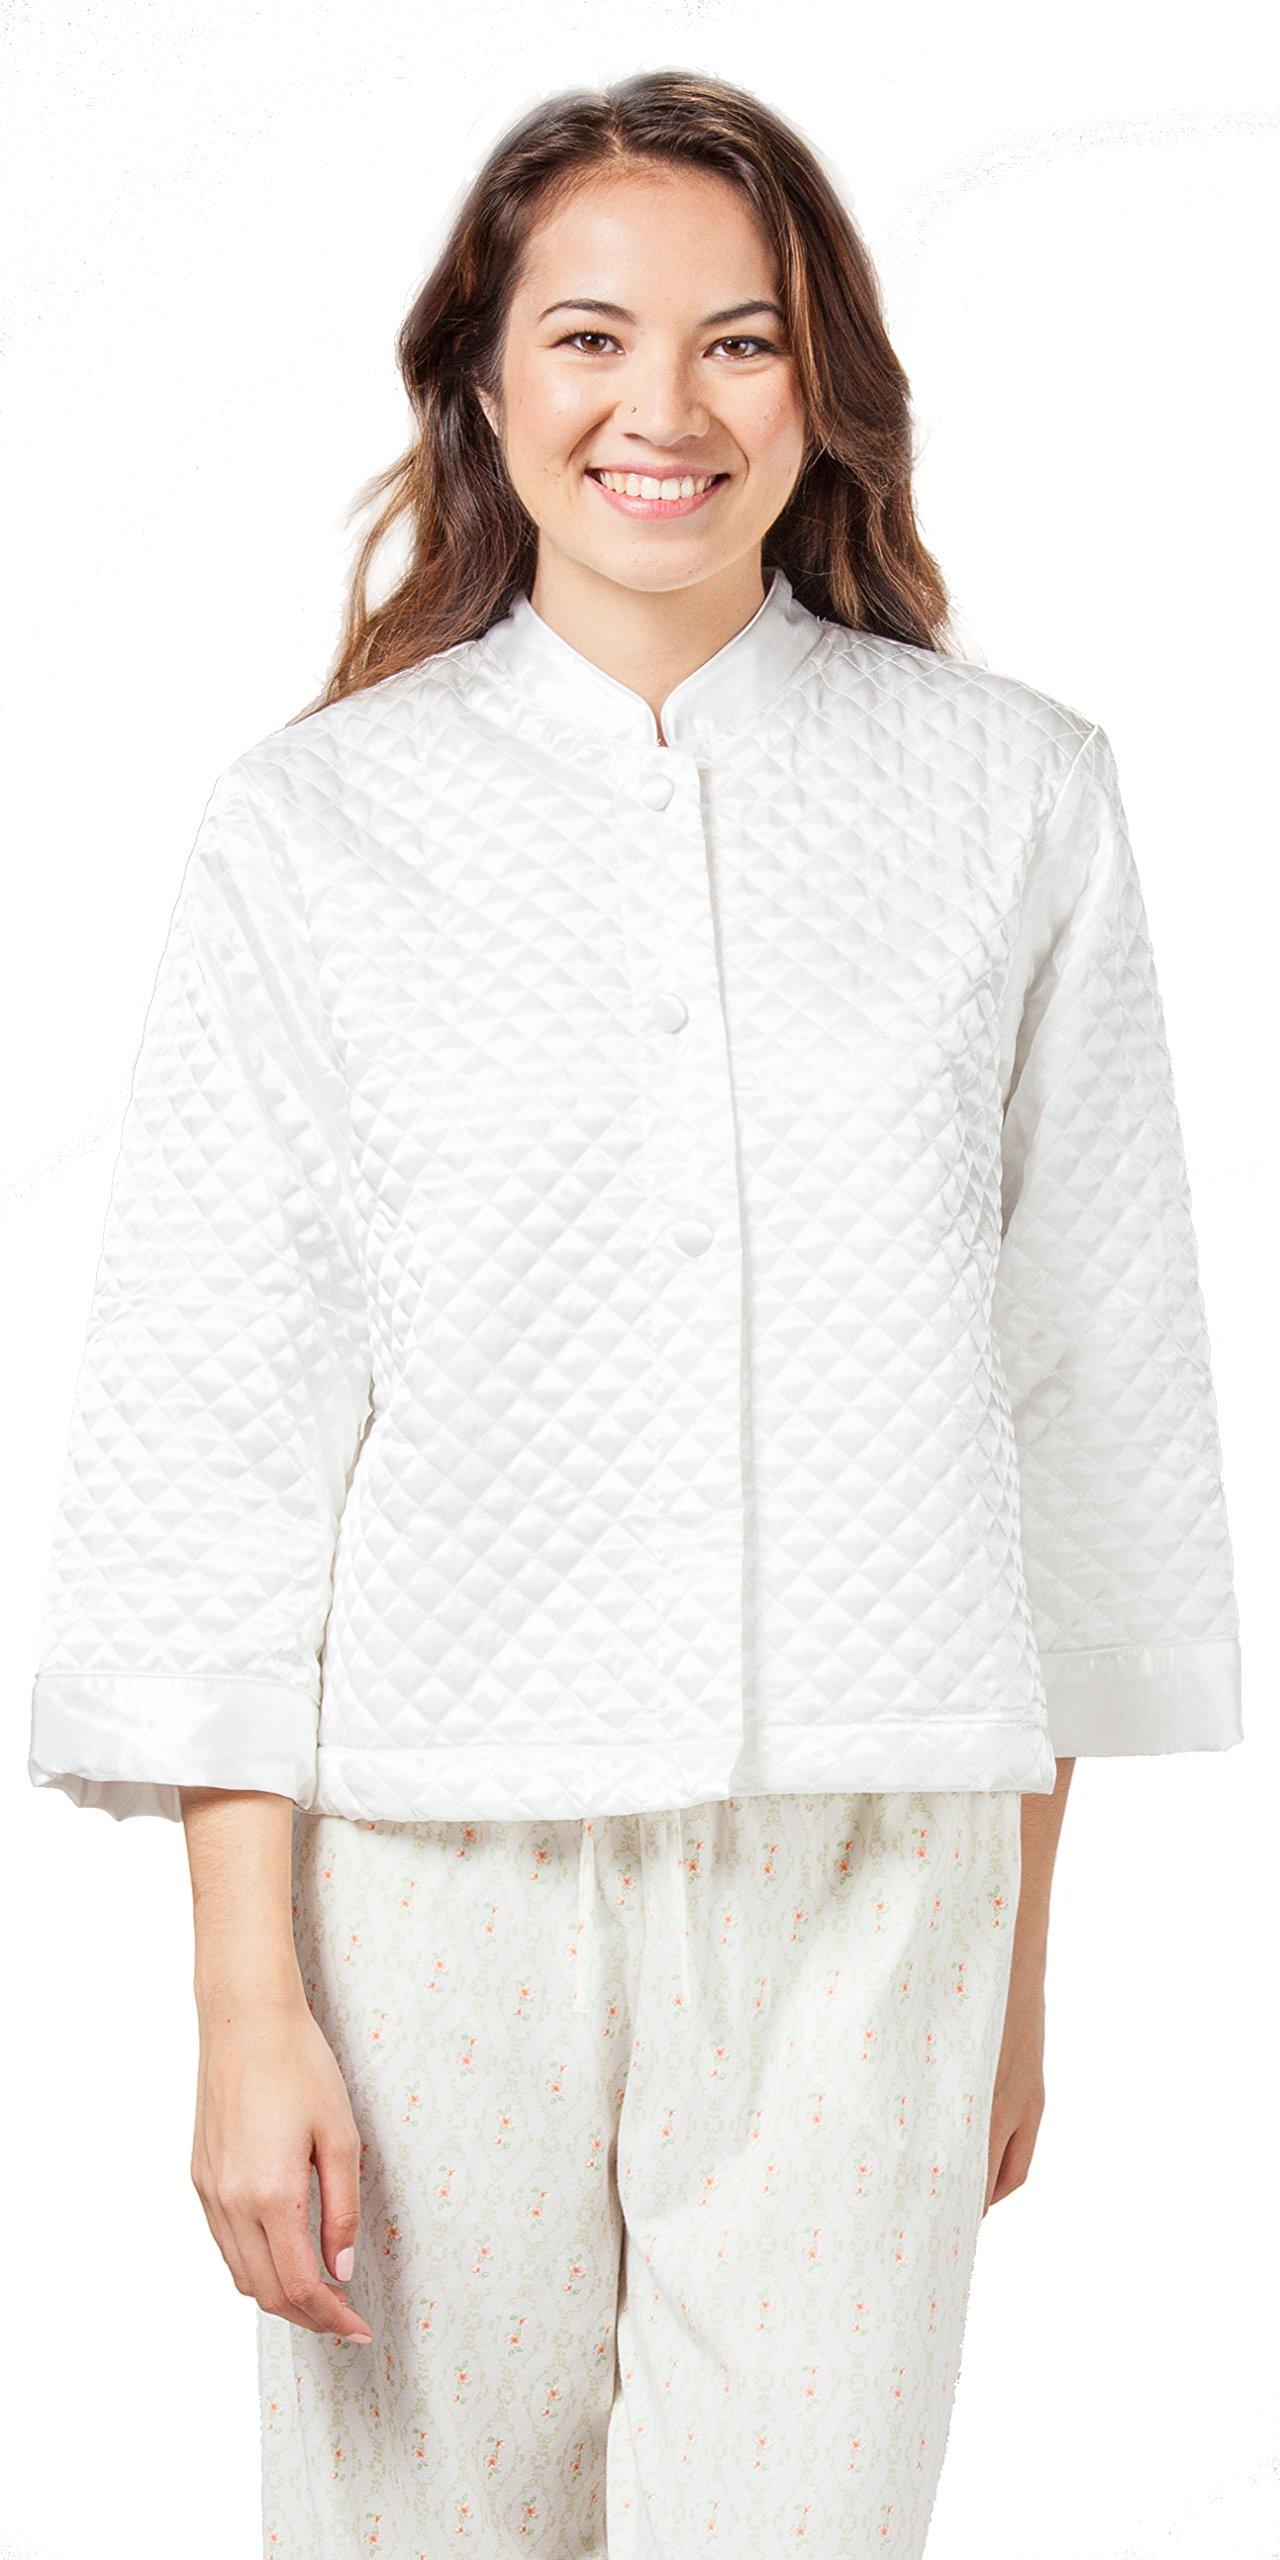 KayAnna Luxurious Quilted Satin Bed Jacket - Ivory (Medium (8-10), Ivory)